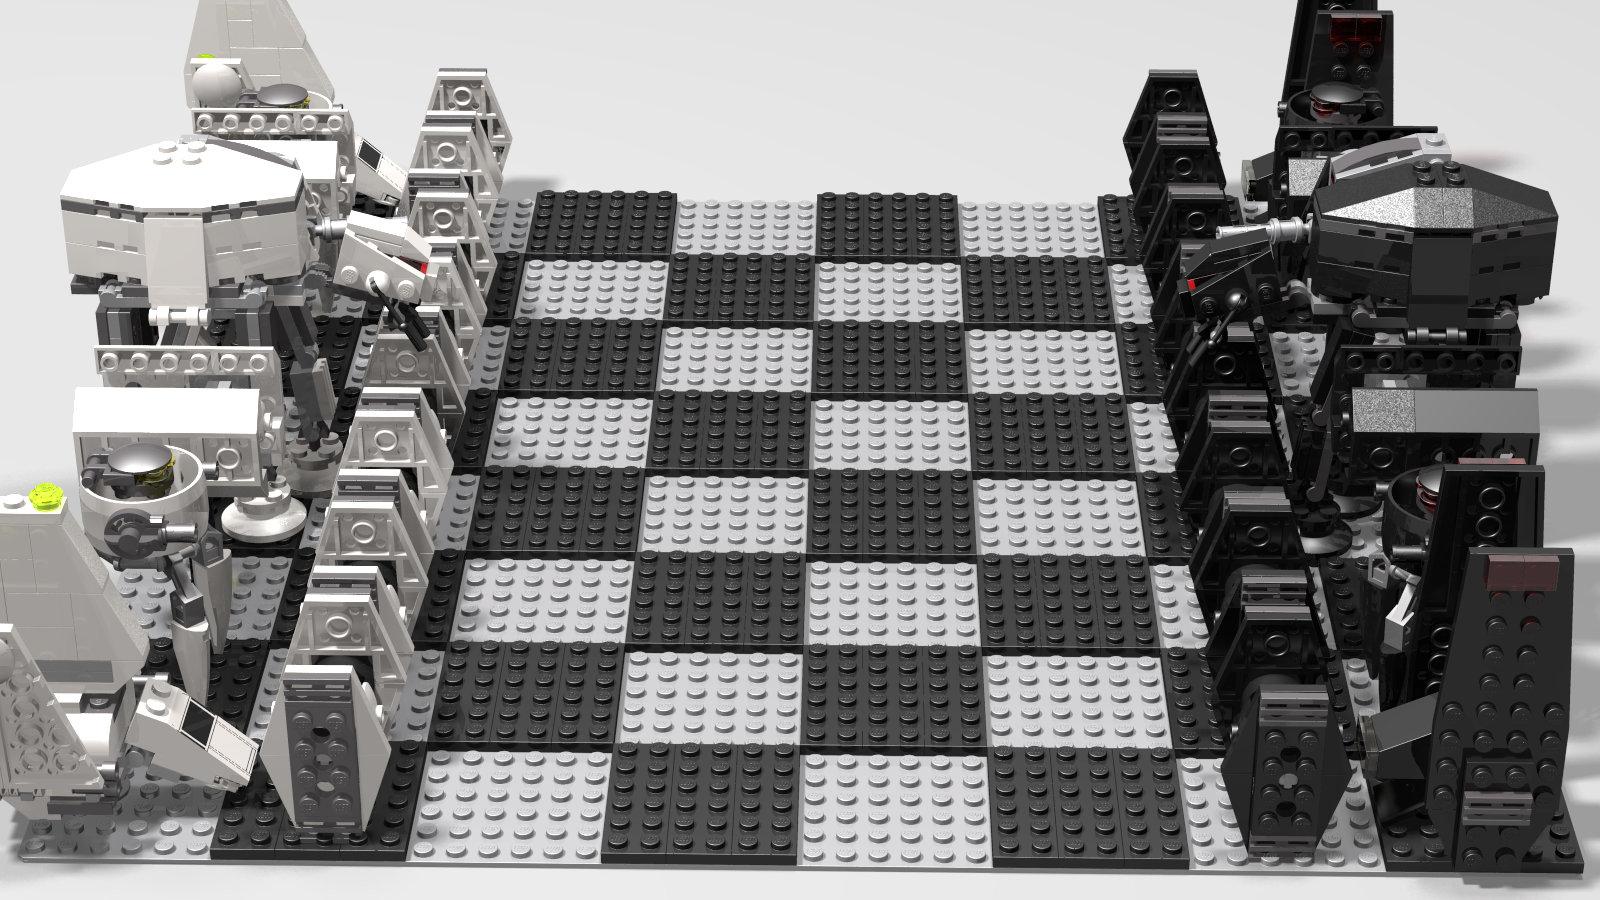 Epic Chess 48x48 #3